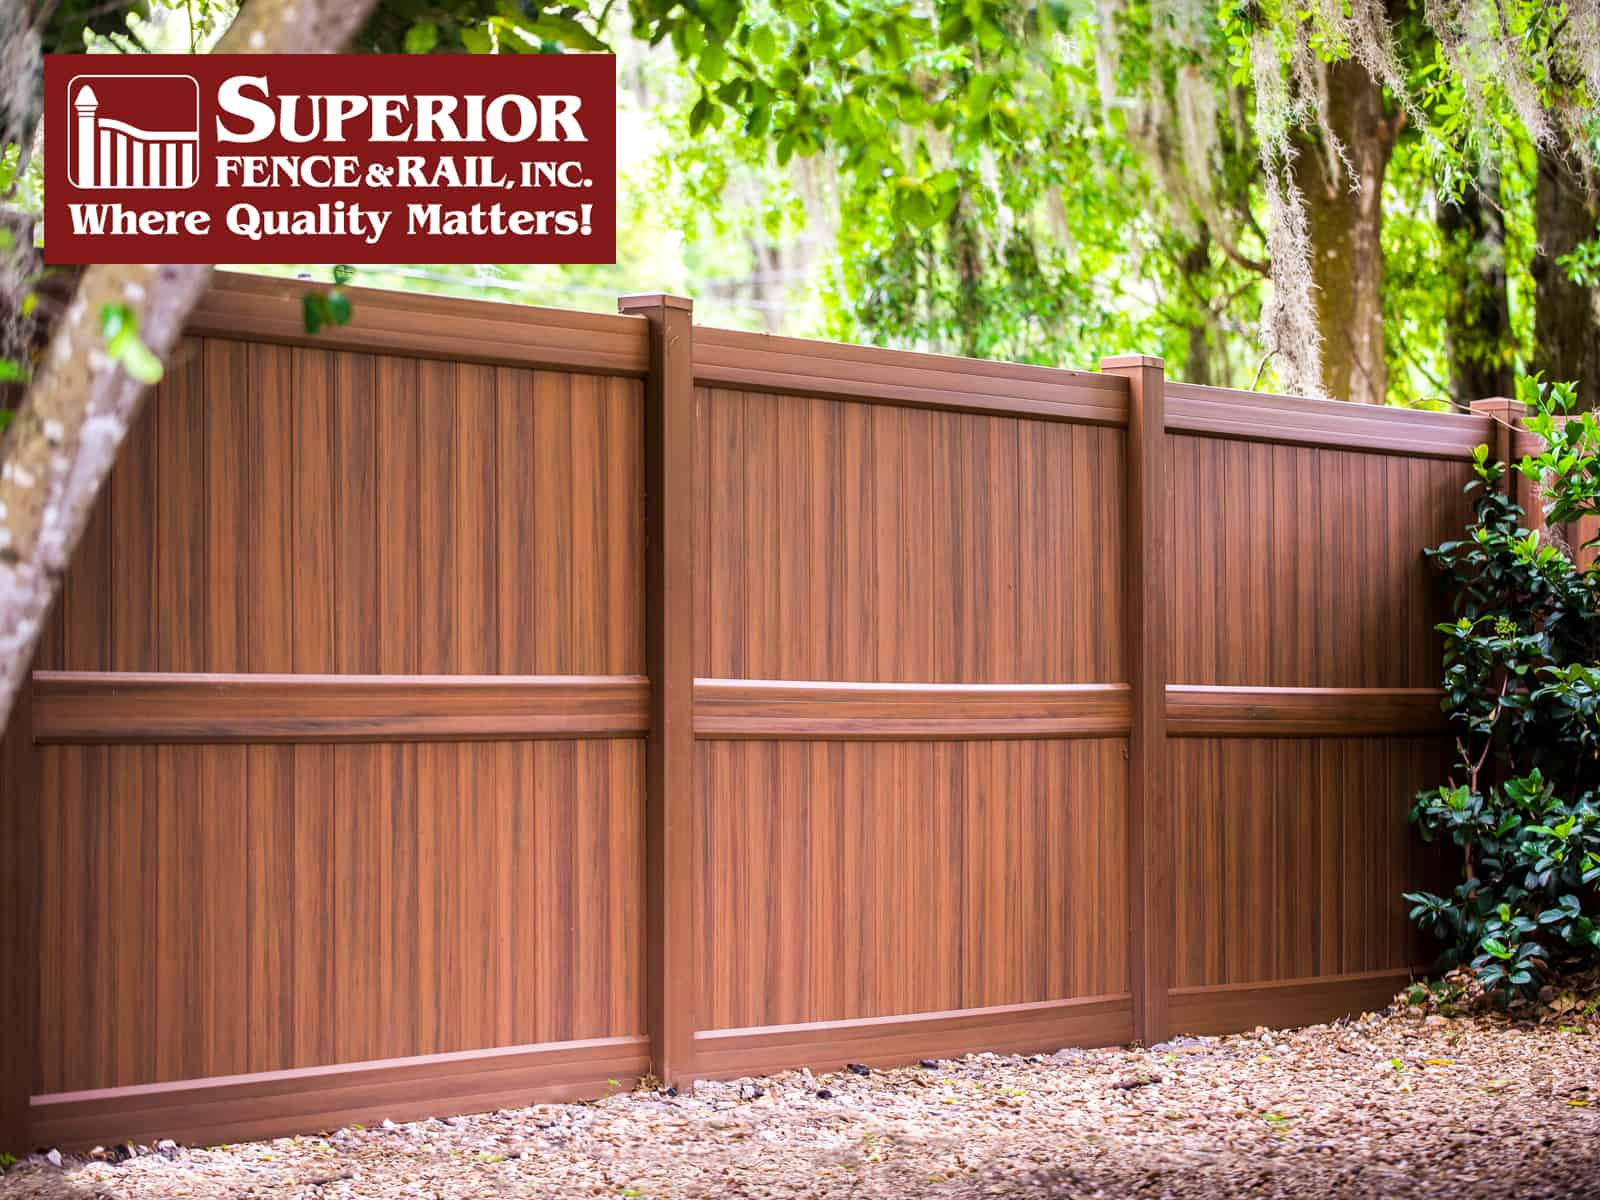 Peachtree Corners Fence Company Contractor